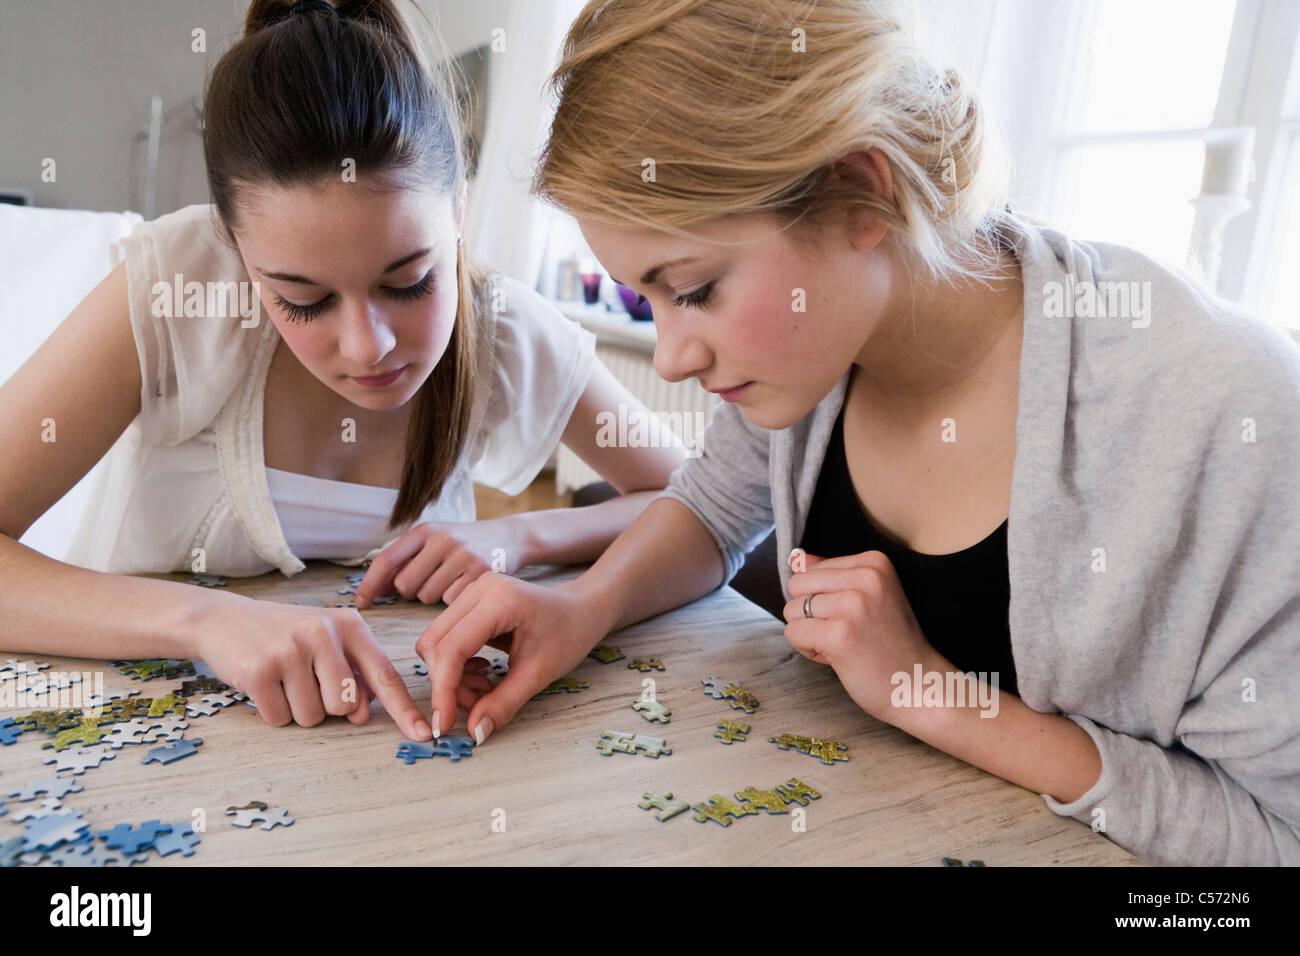 Teenage girls working on jigsaw puzzle - Stock Image